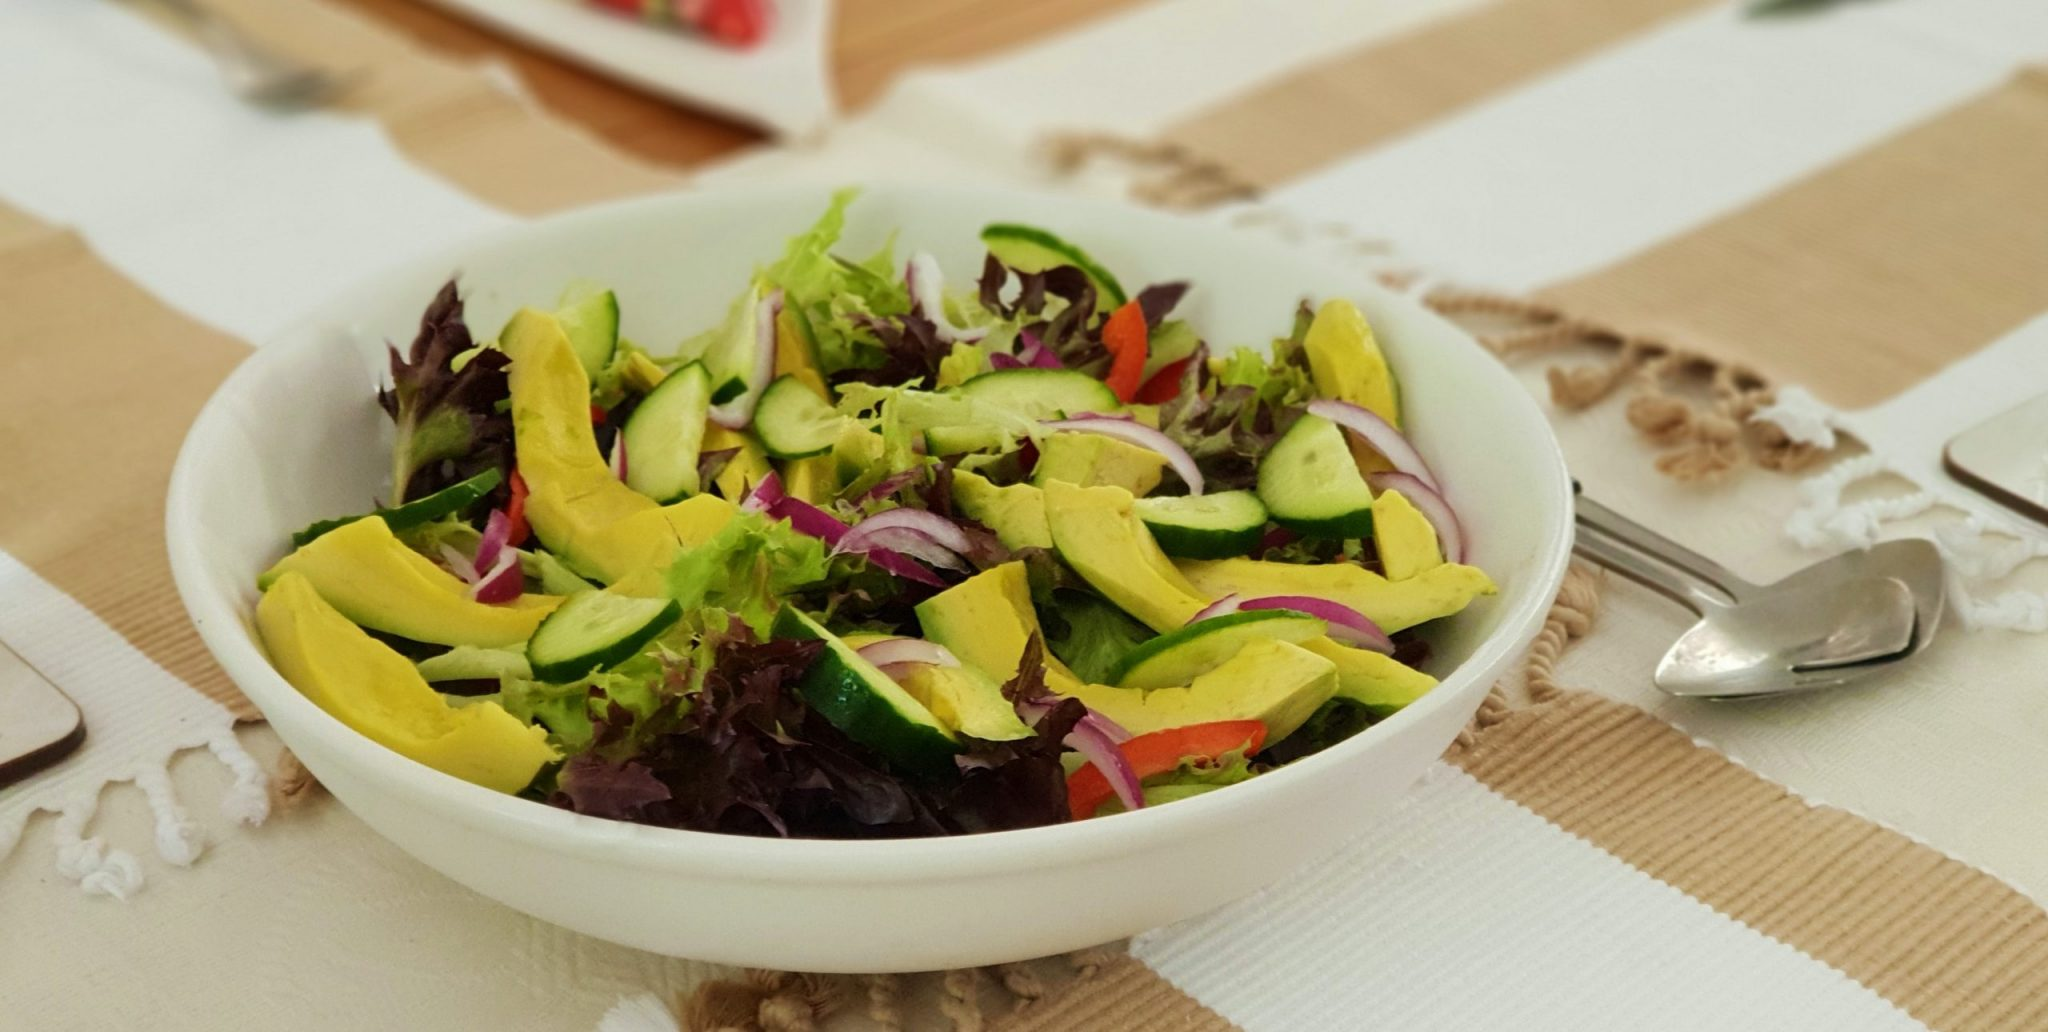 Fresh market salad in a white bowl